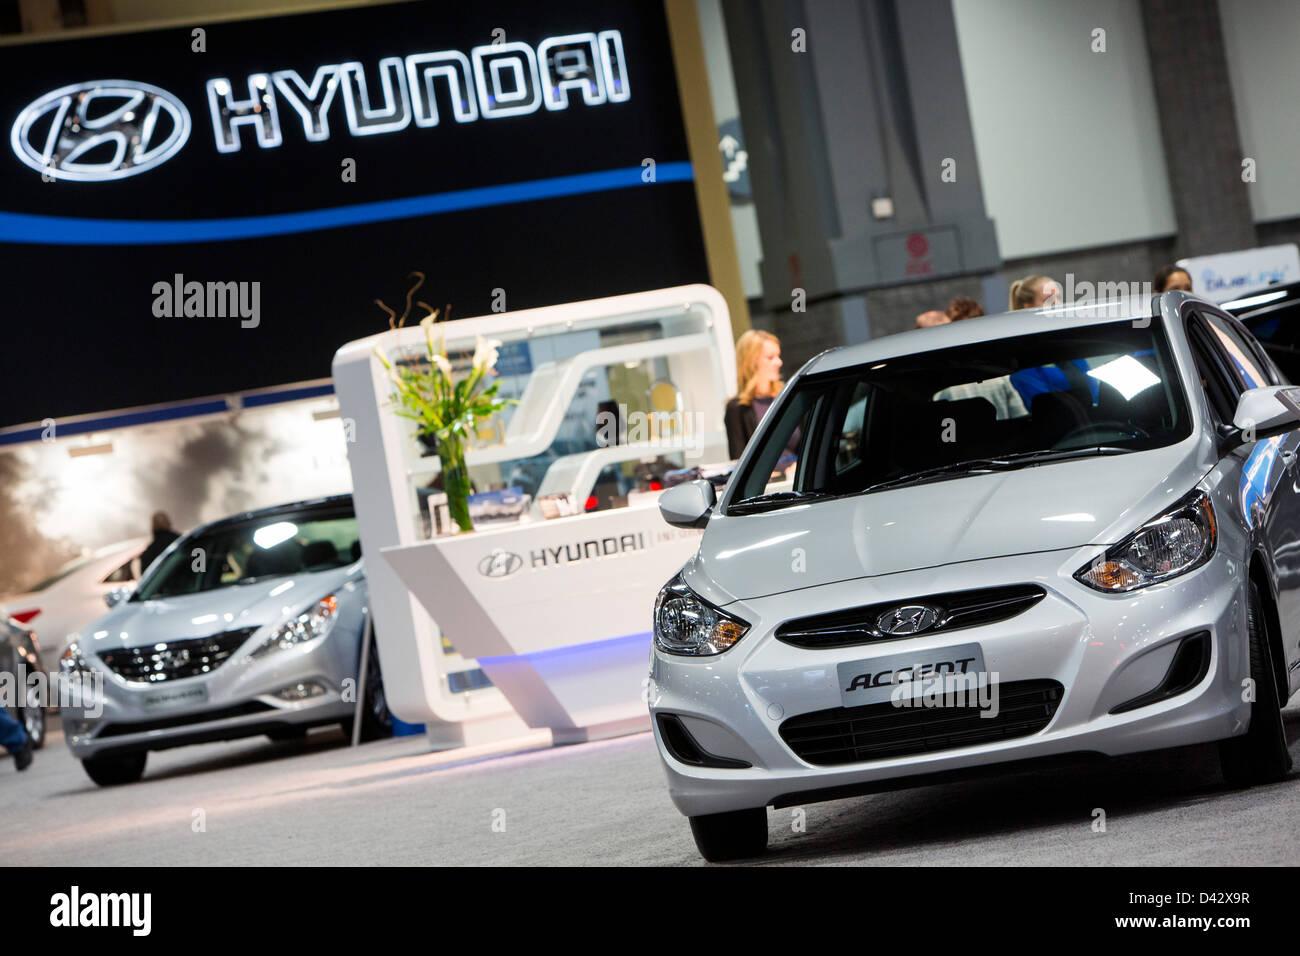 2013 veicoli Hyundai sul display a 2013 Washington, DC Auto Show. Immagini Stock